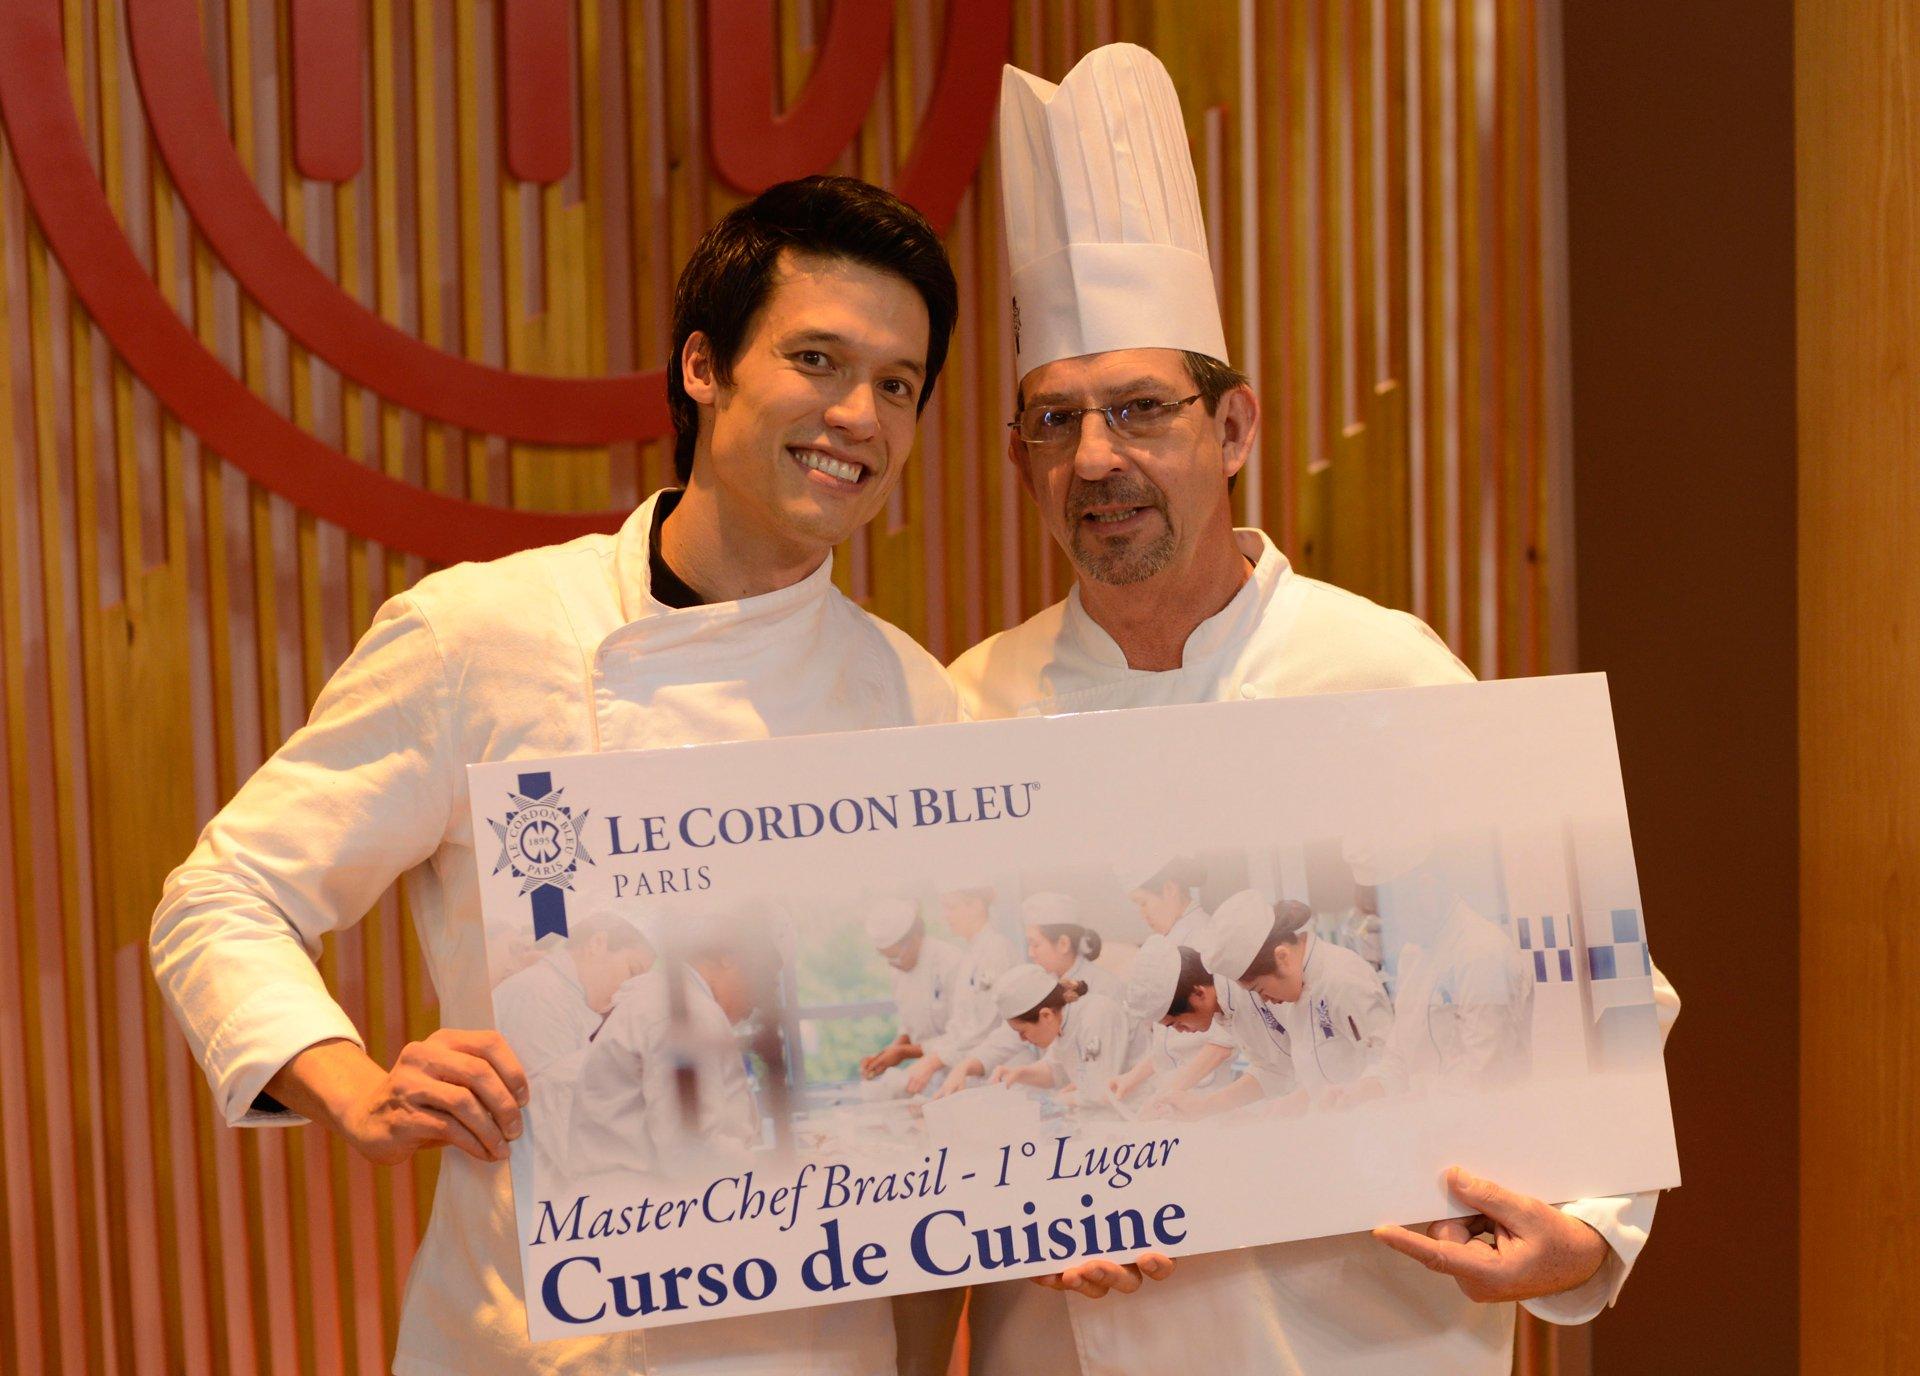 Masterchef Brasil winner 2016 - Leonardo